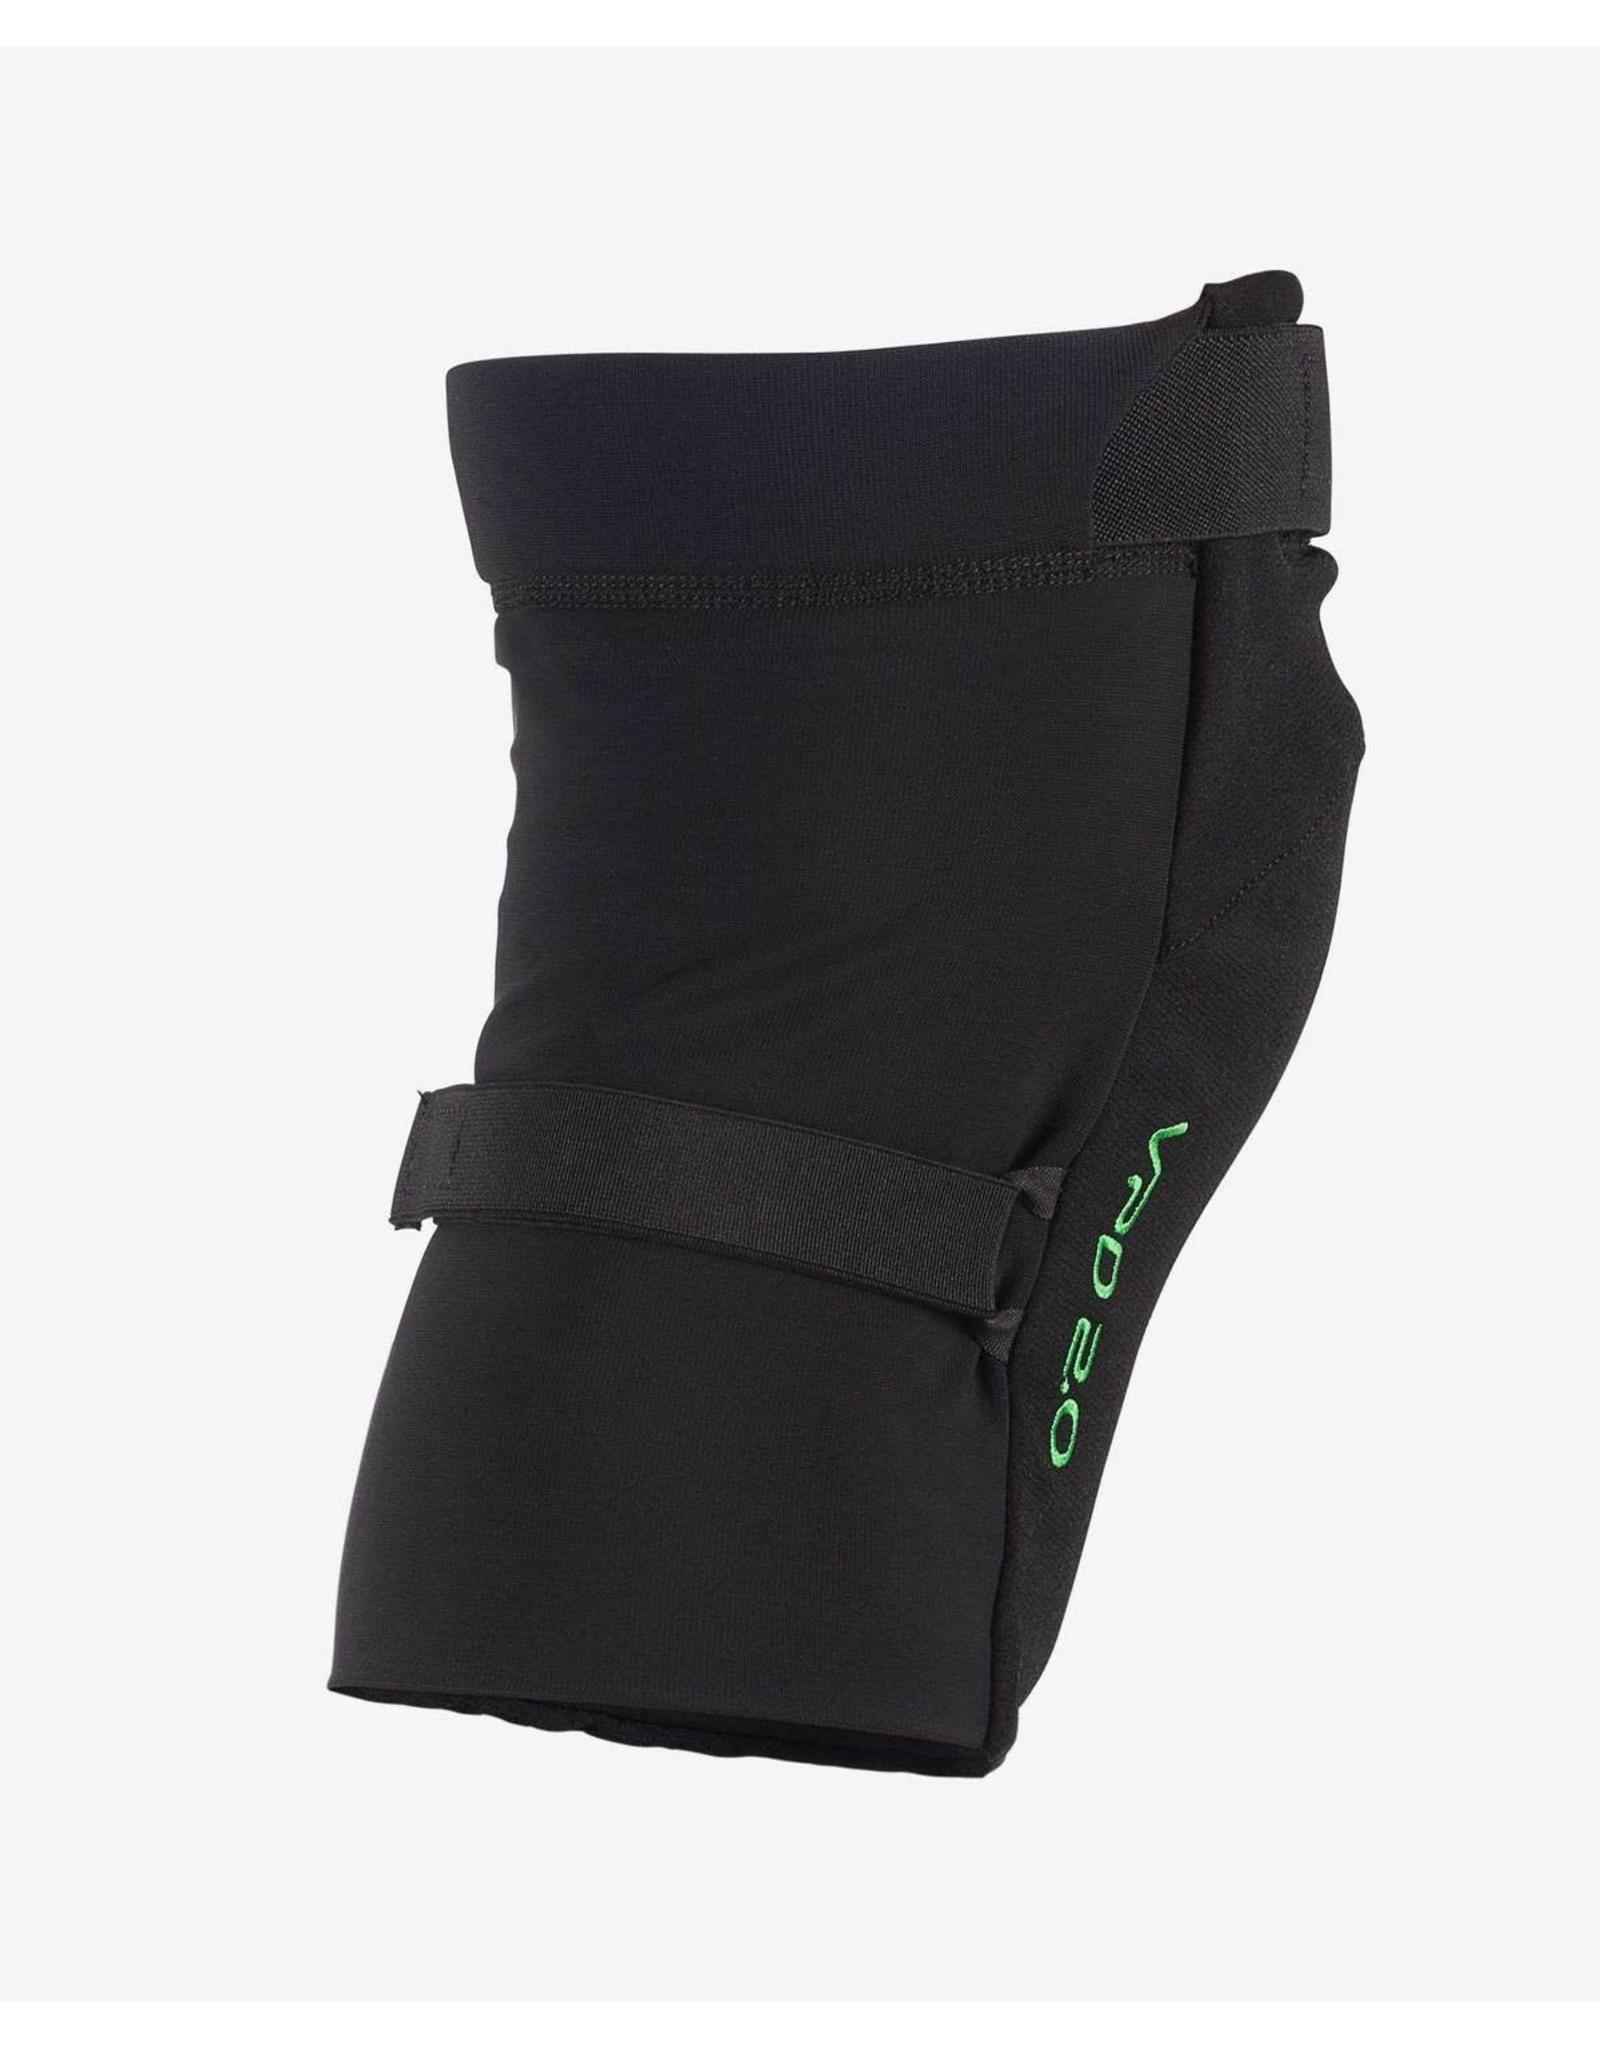 POC Knee pads POC Joint VPD 2.0